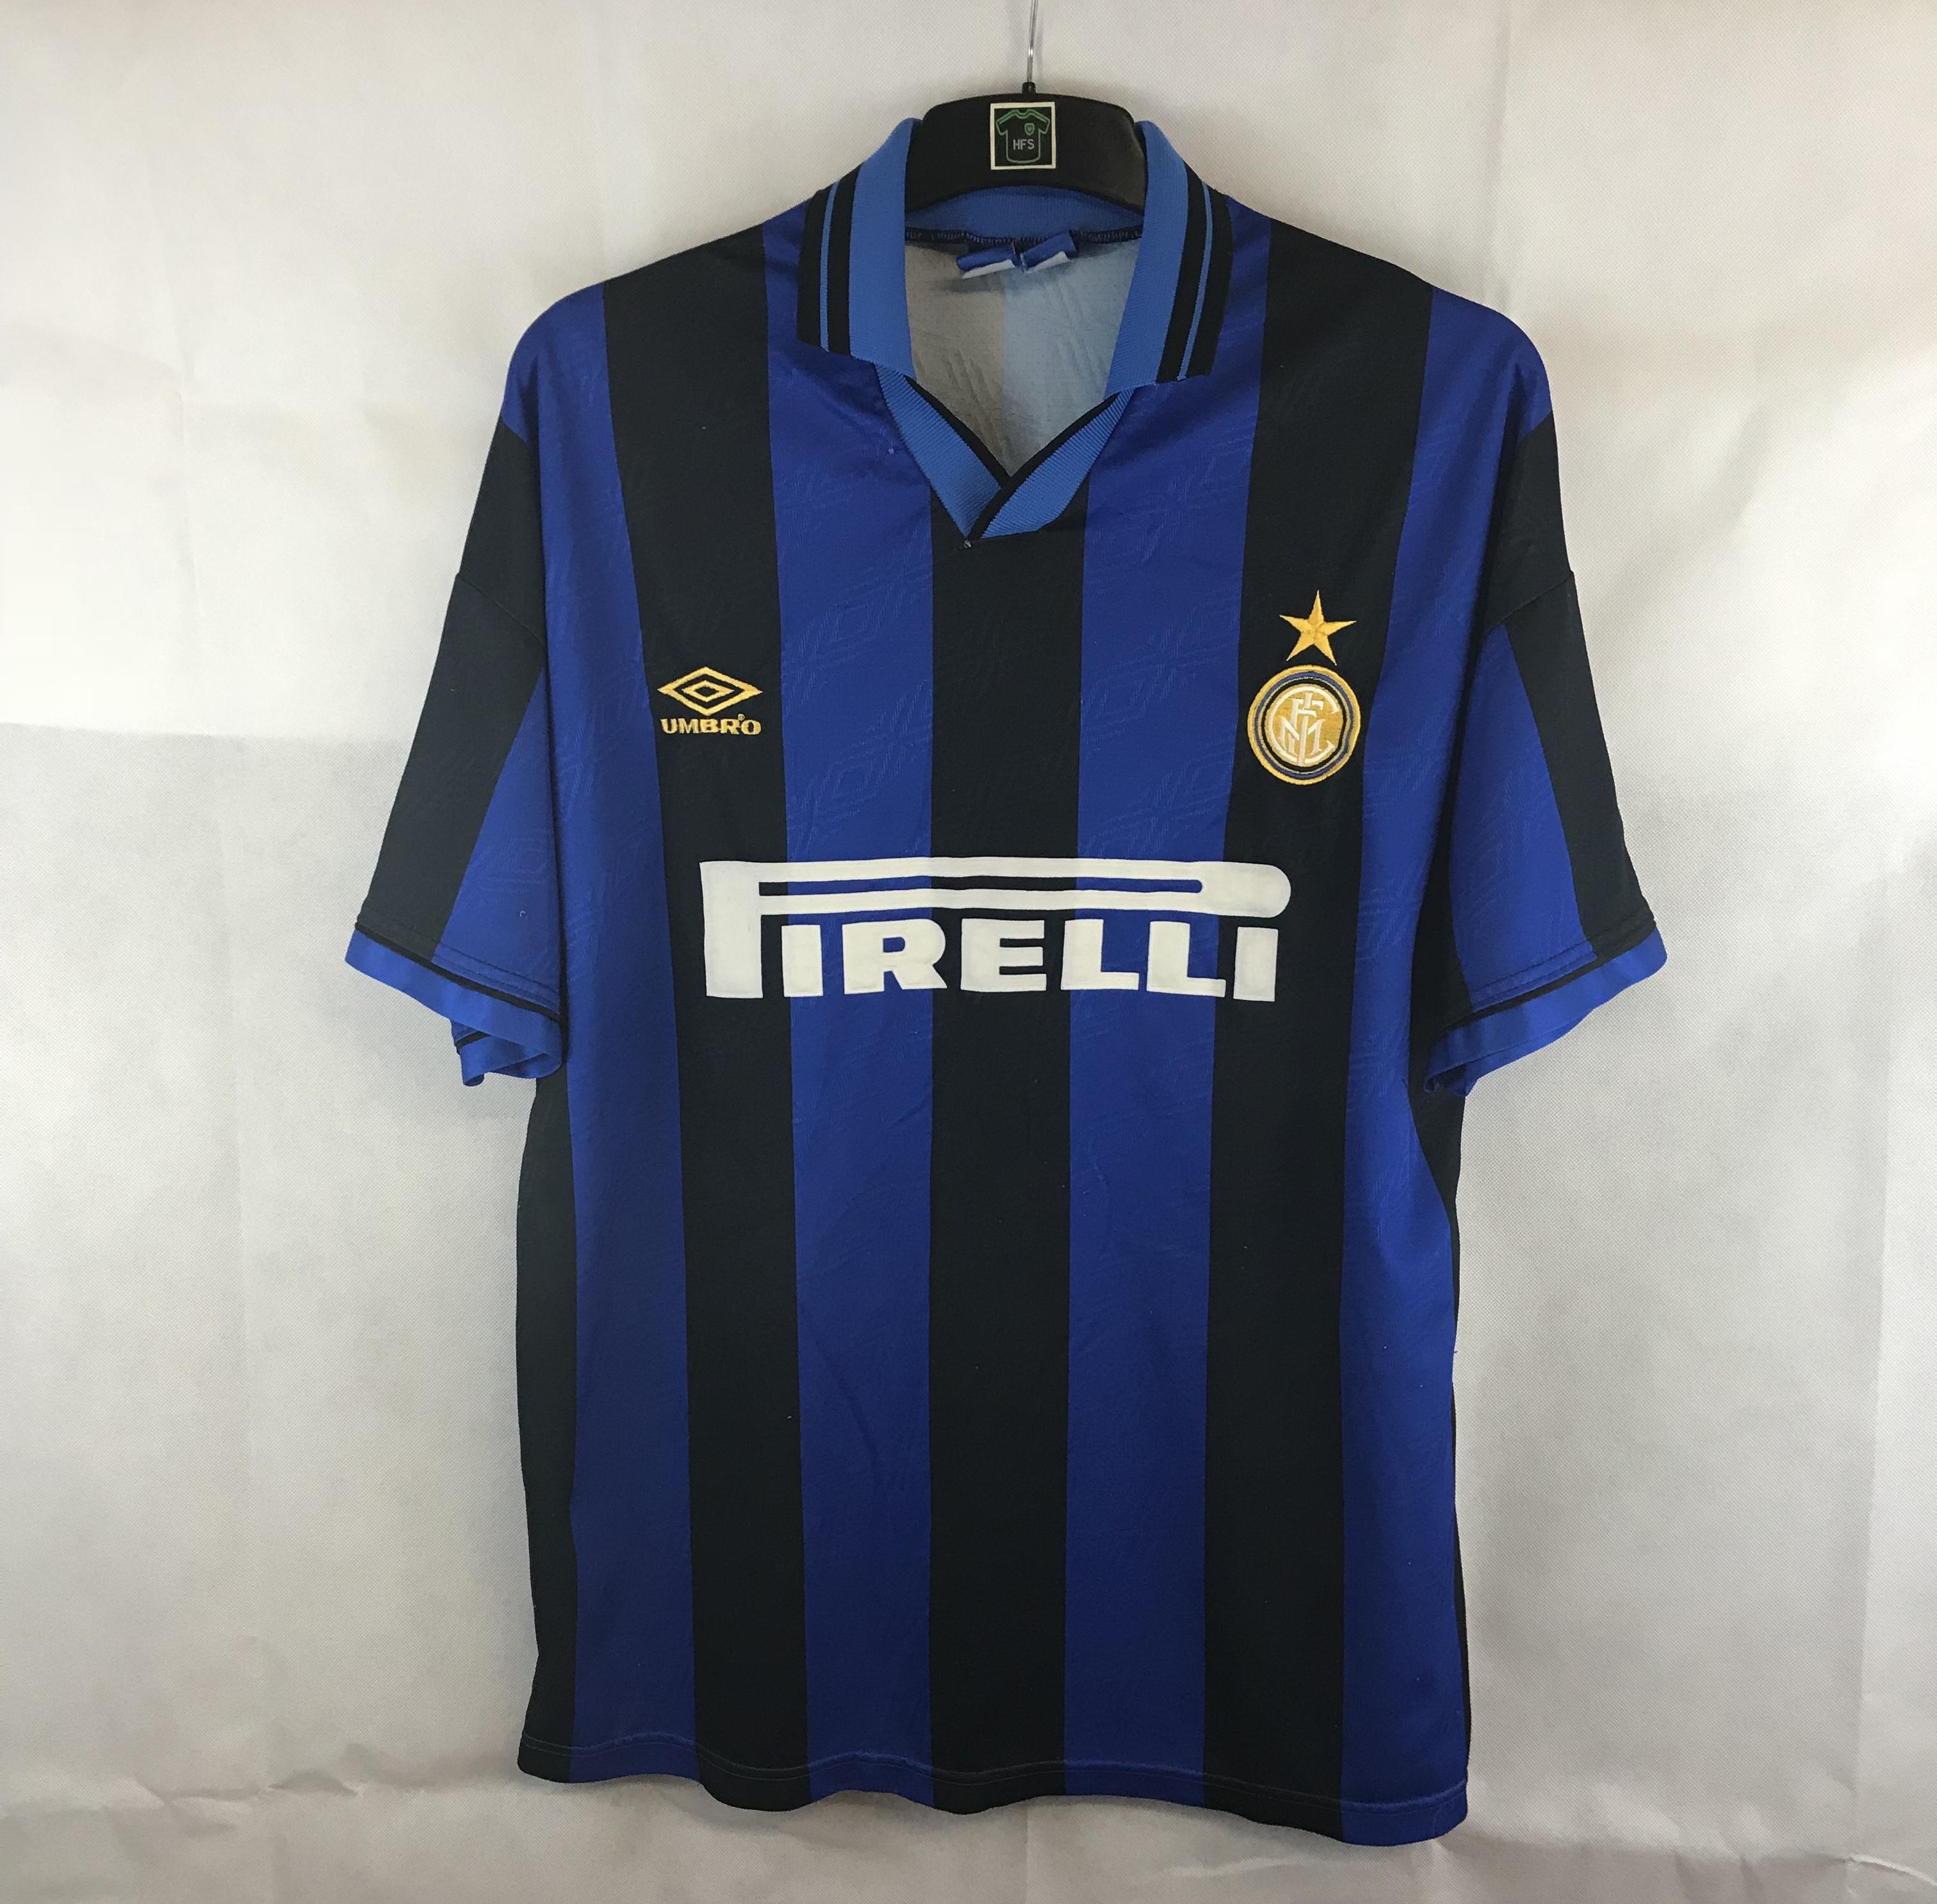 58a52de23 Inter Milan Home Football Shirt 1995/96 Adults XL Umbro – Historic ...